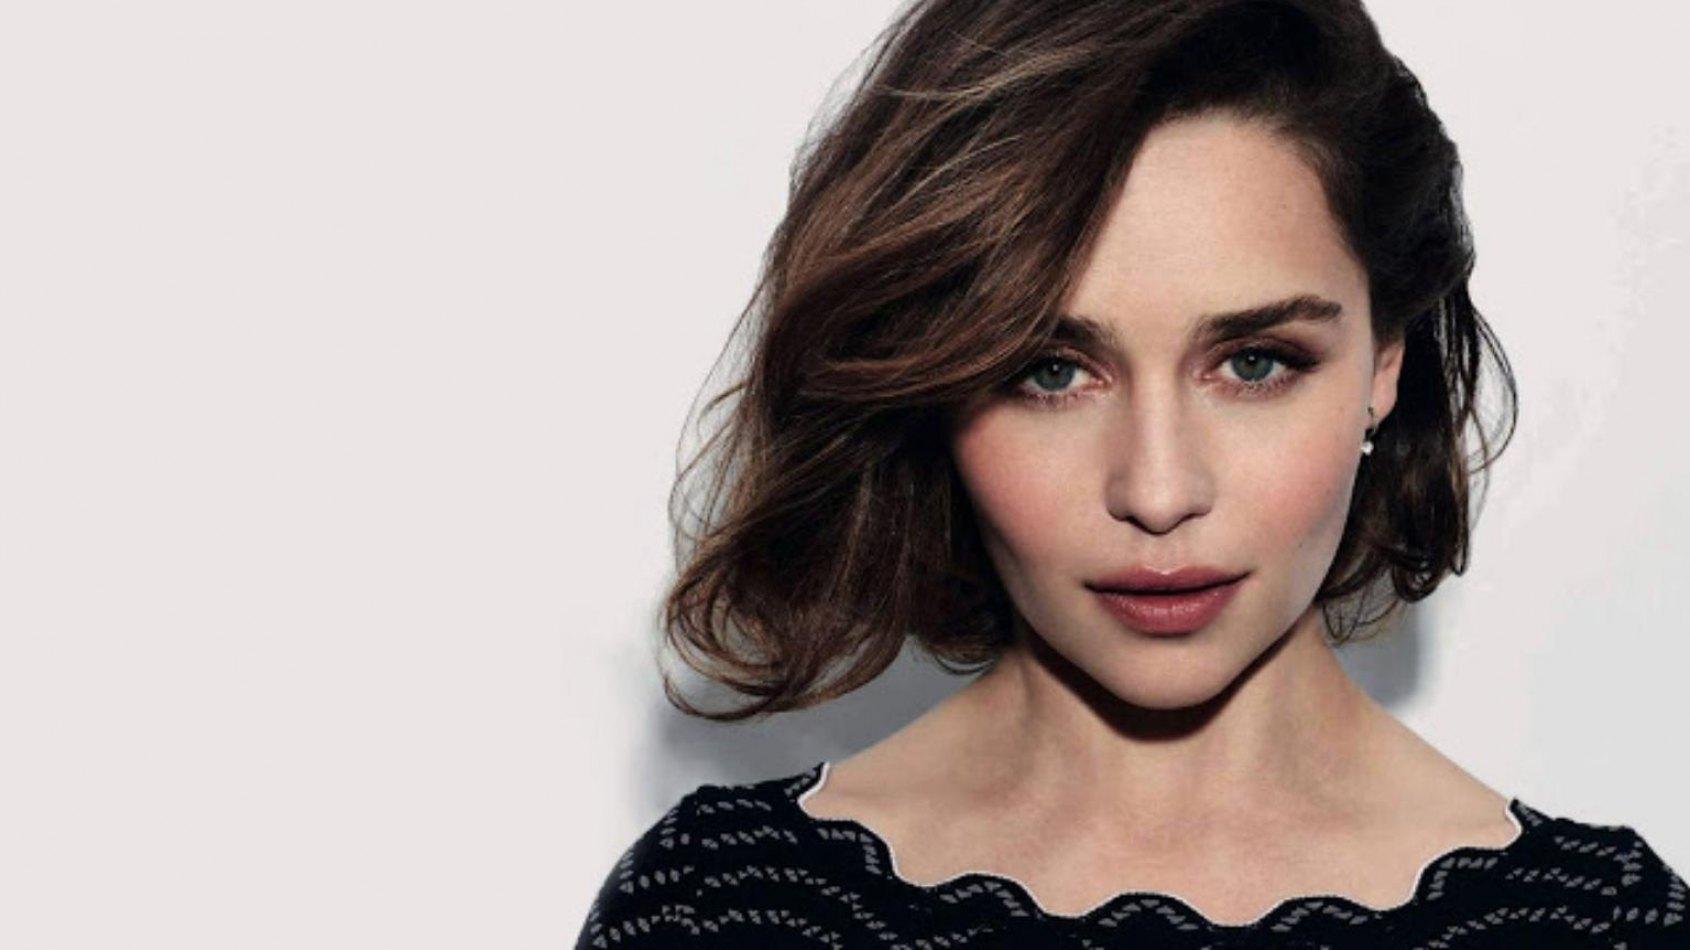 Emilia Clarke sera dans le spin-off sur Han Solo!